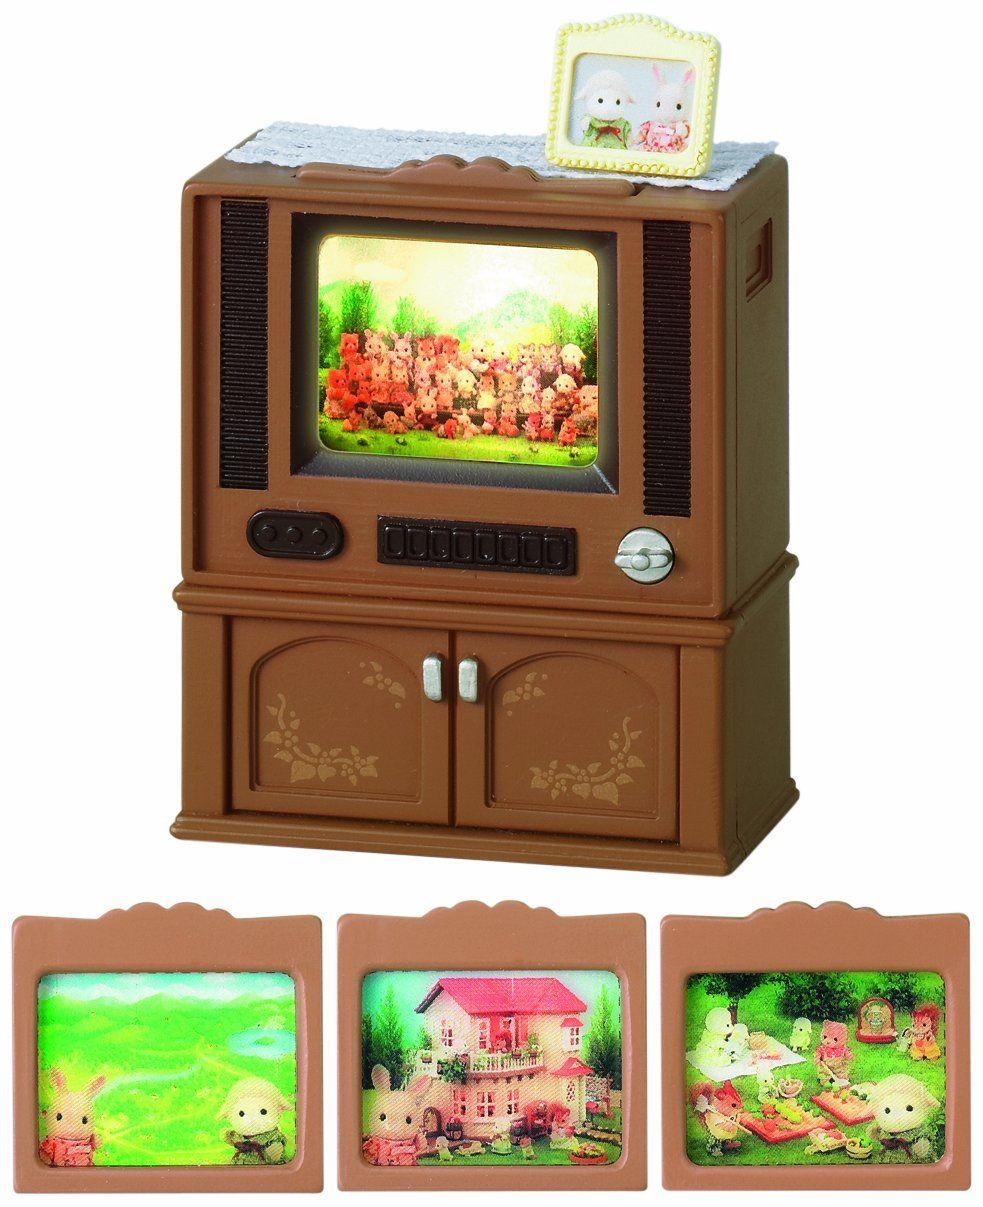 Amazon com sylvanian families deluxe tv set 4264 new toys games